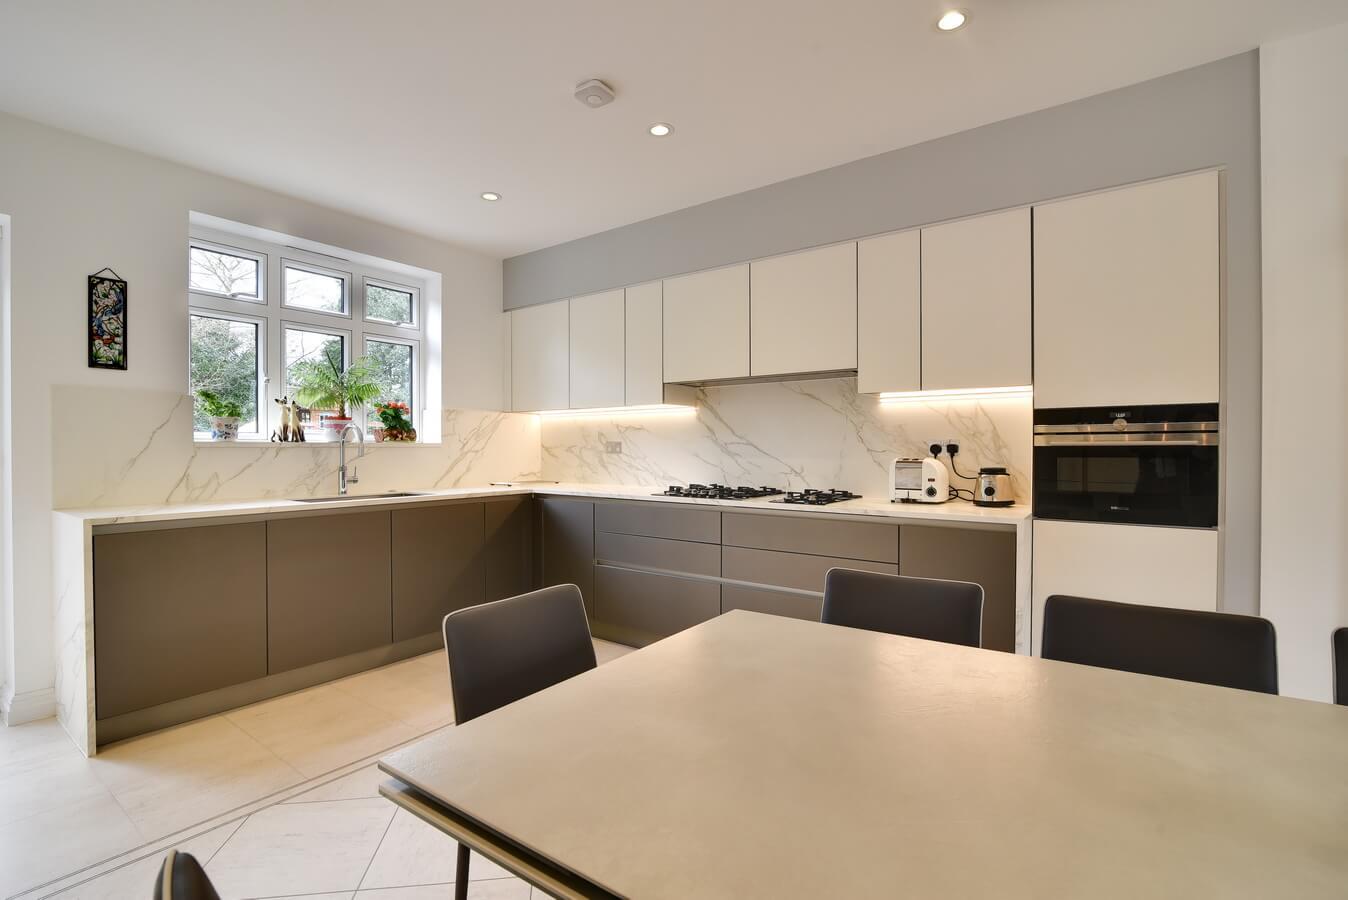 Kitchen-Splashbag-Neoligh-German-Modern.jpg